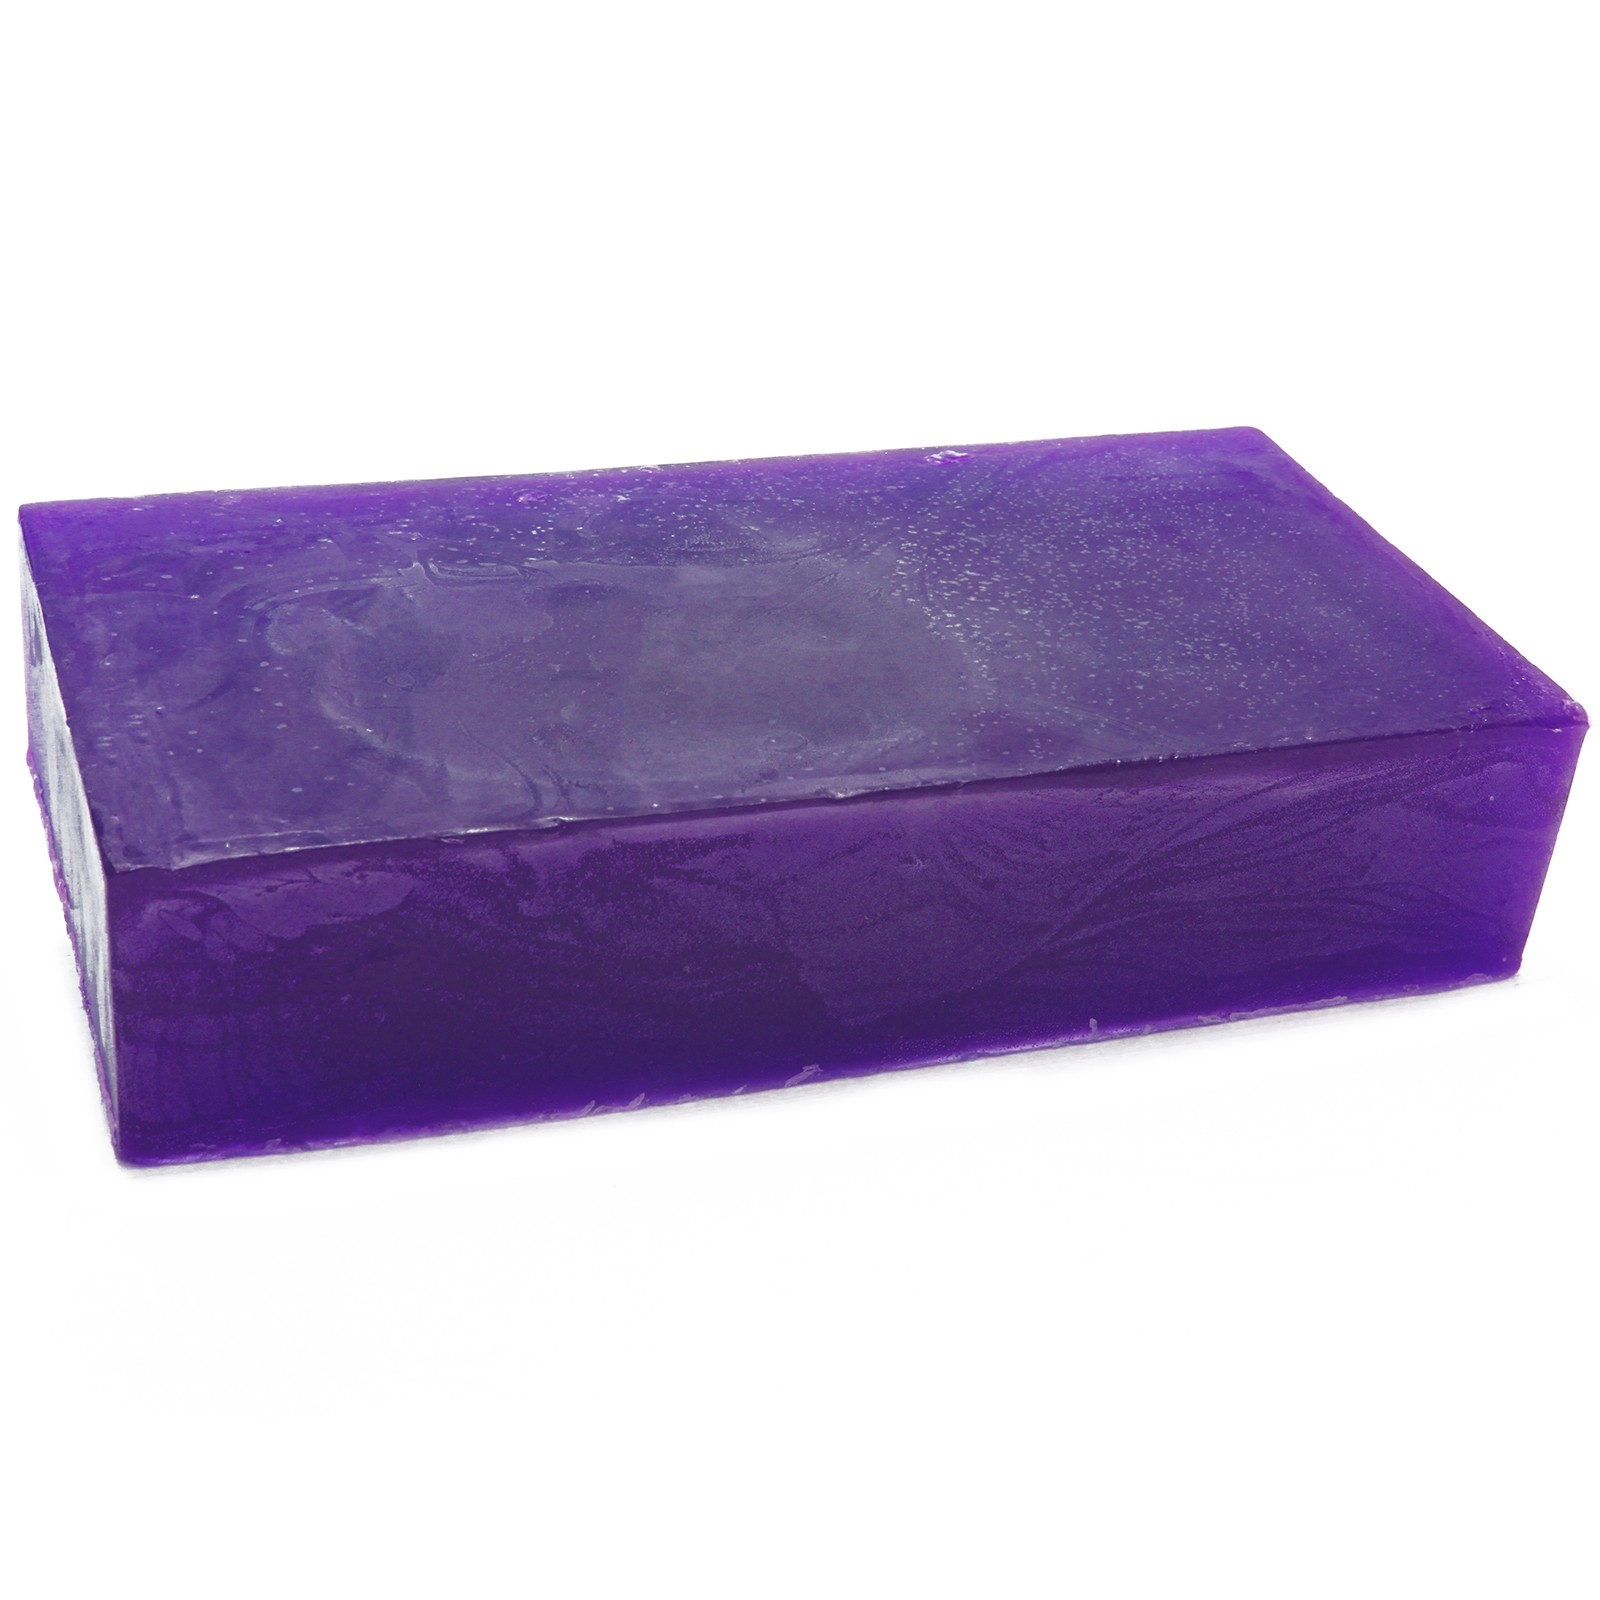 Geranium Essential Oil Soap Loaf 2kg